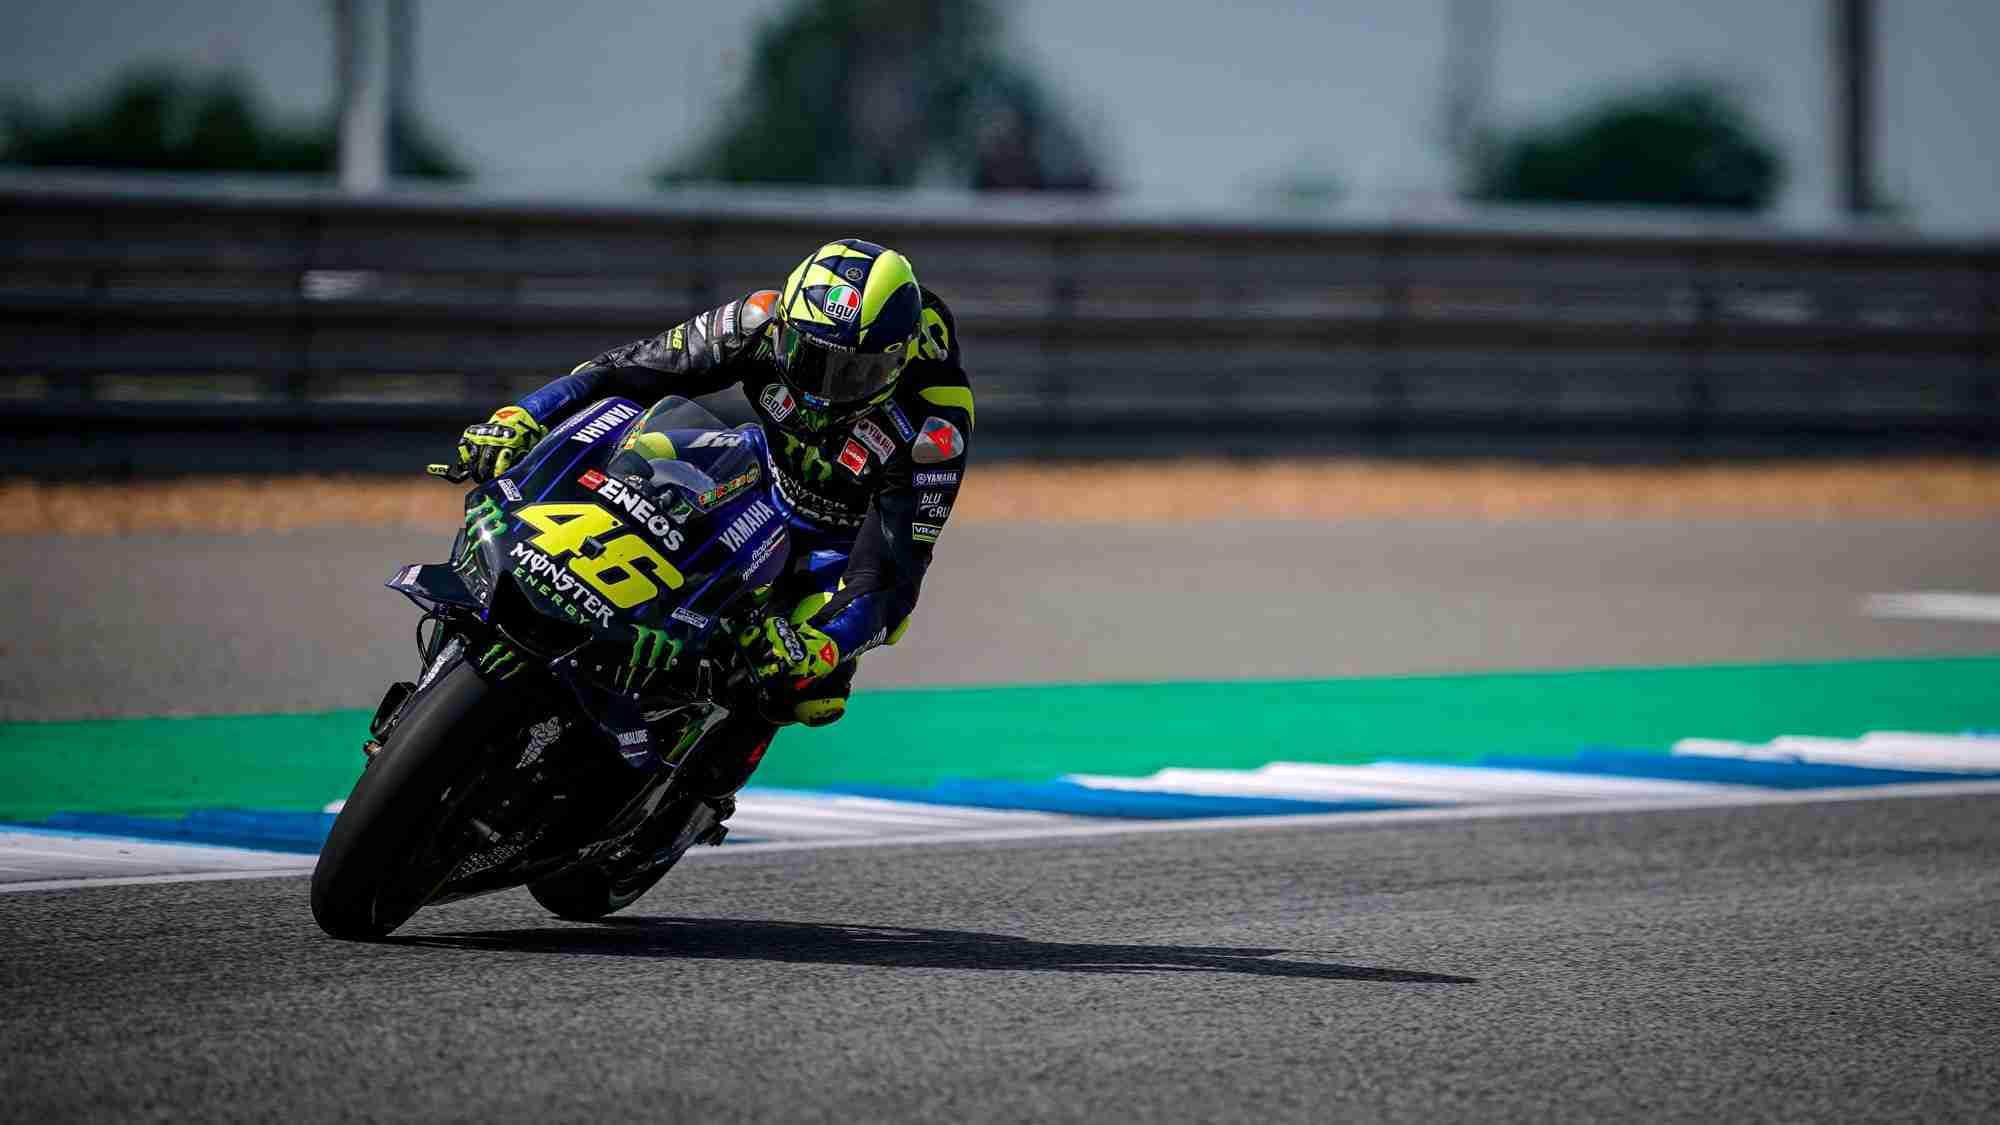 Alex Rins - HD wallpapers from MotoGP Motegi 2019